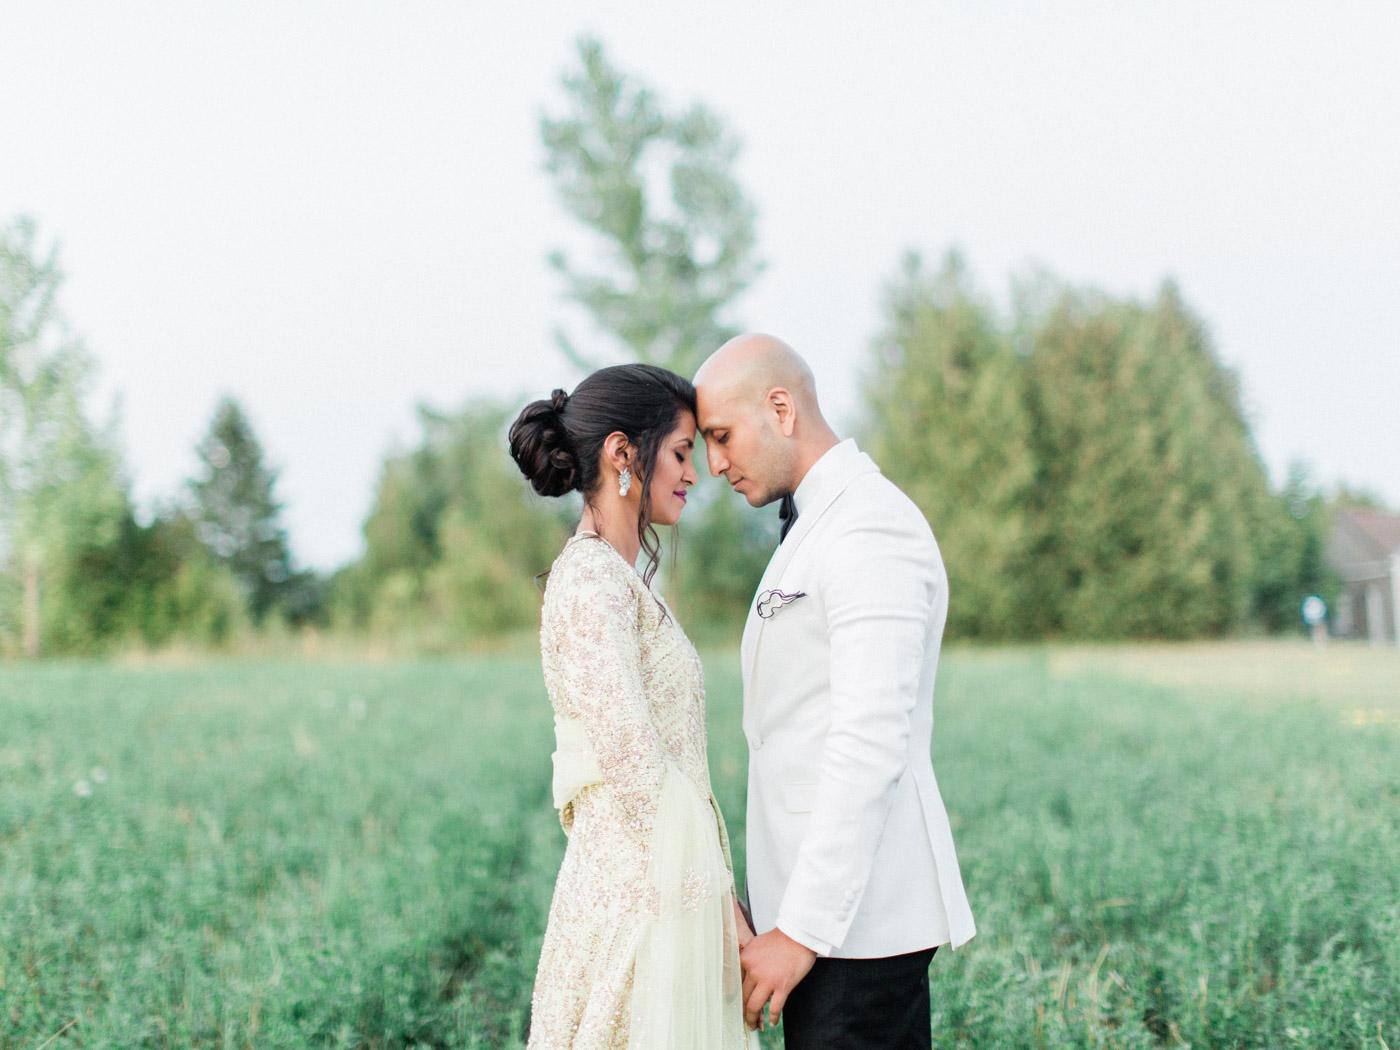 Toronto-Collingwood-wedding-photographer-indian-wedding-documentary181.jpg